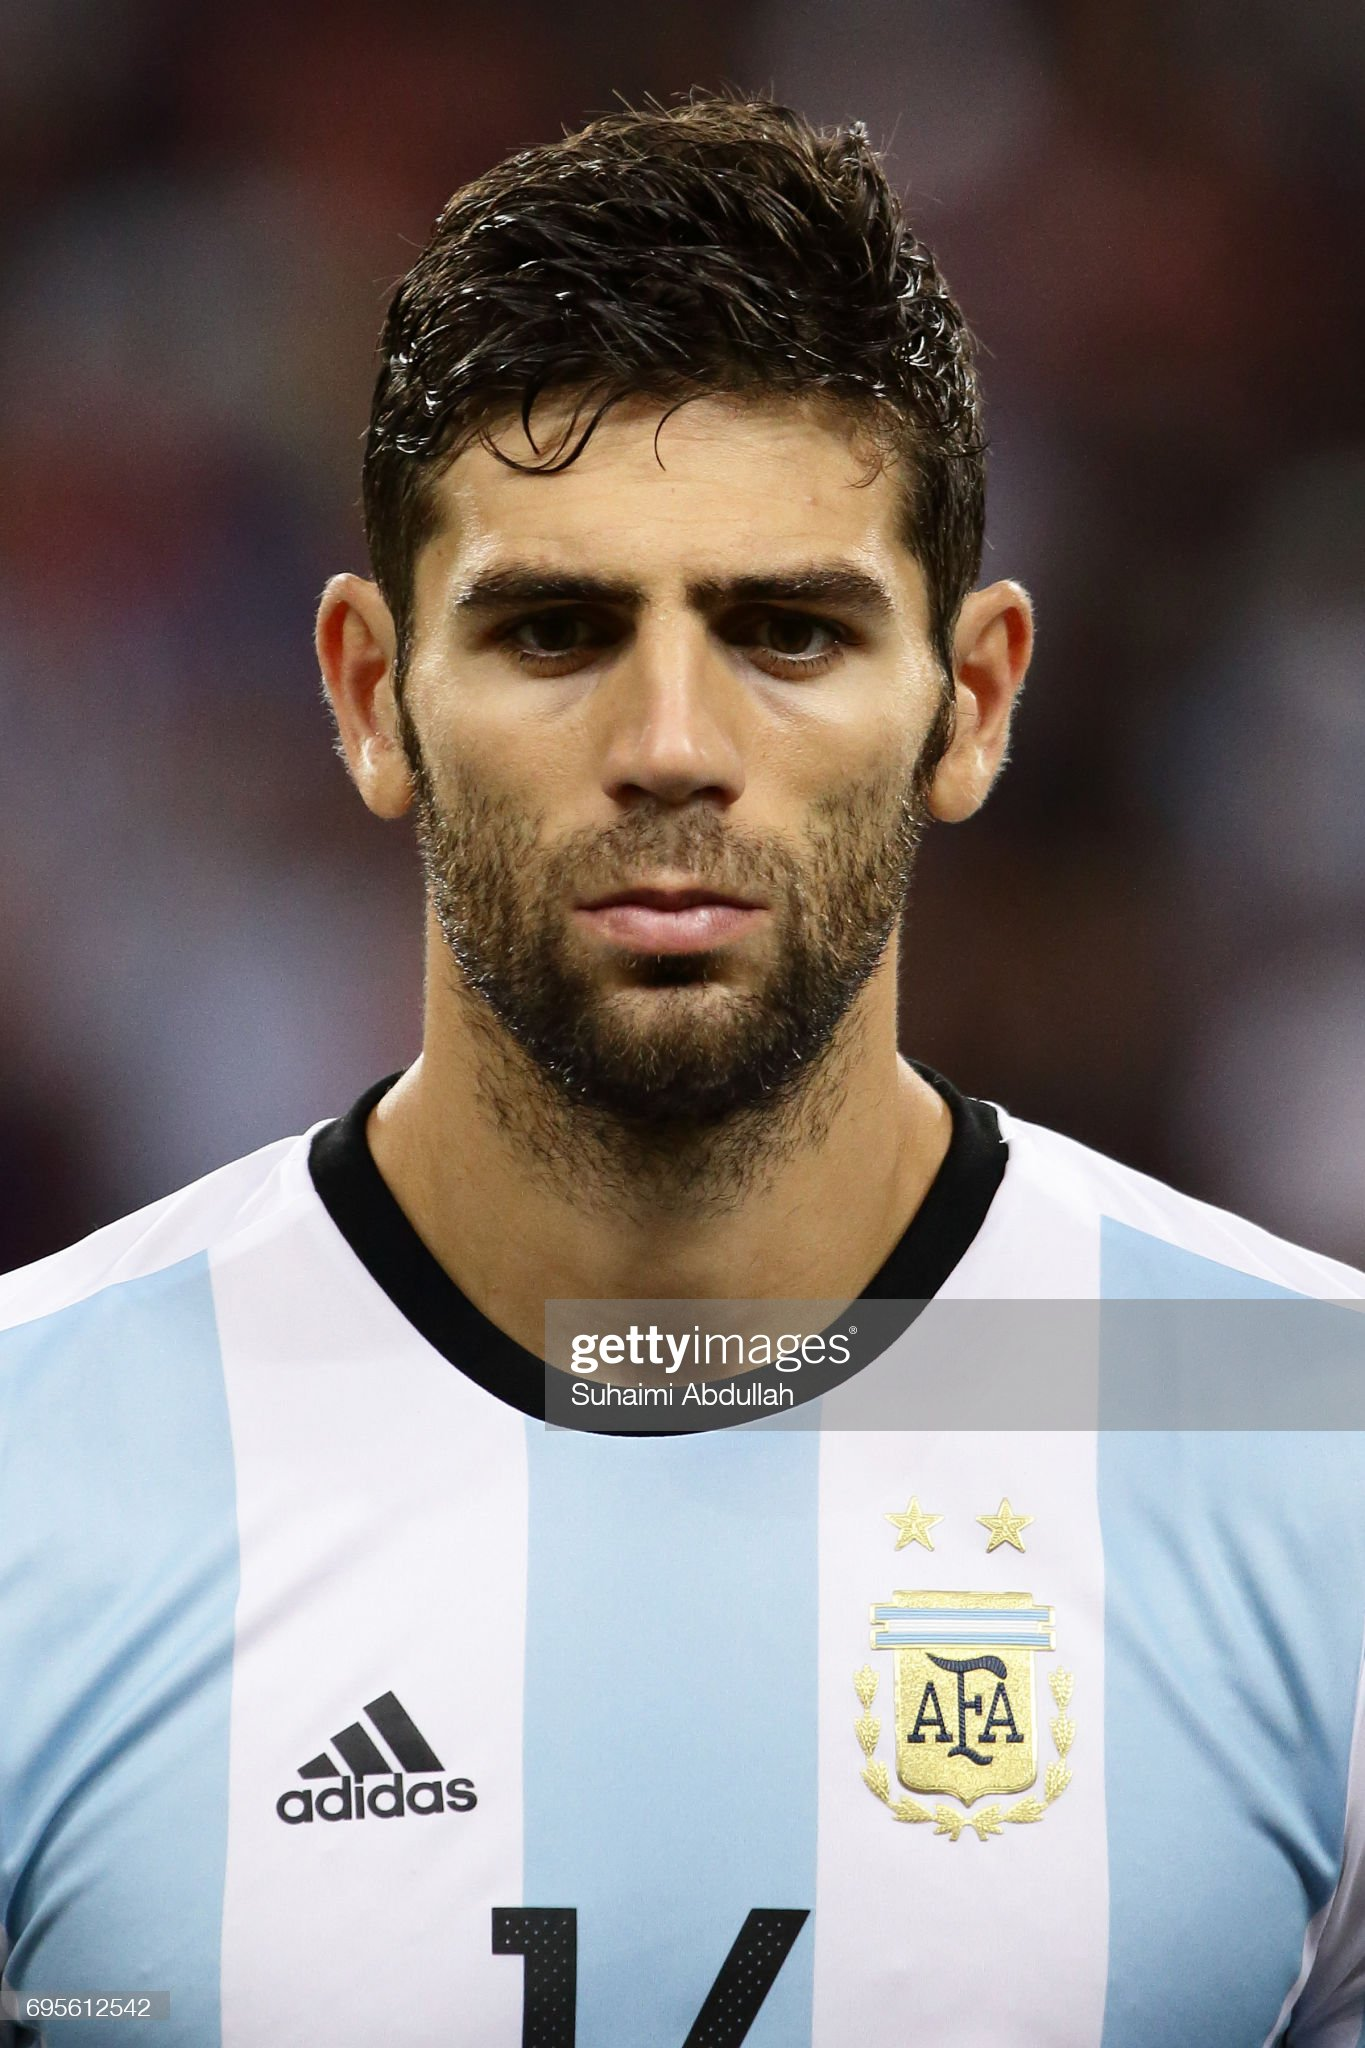 [Imagen: federico-fazio-of-argentina-lines-up-on-...=2048x2048]